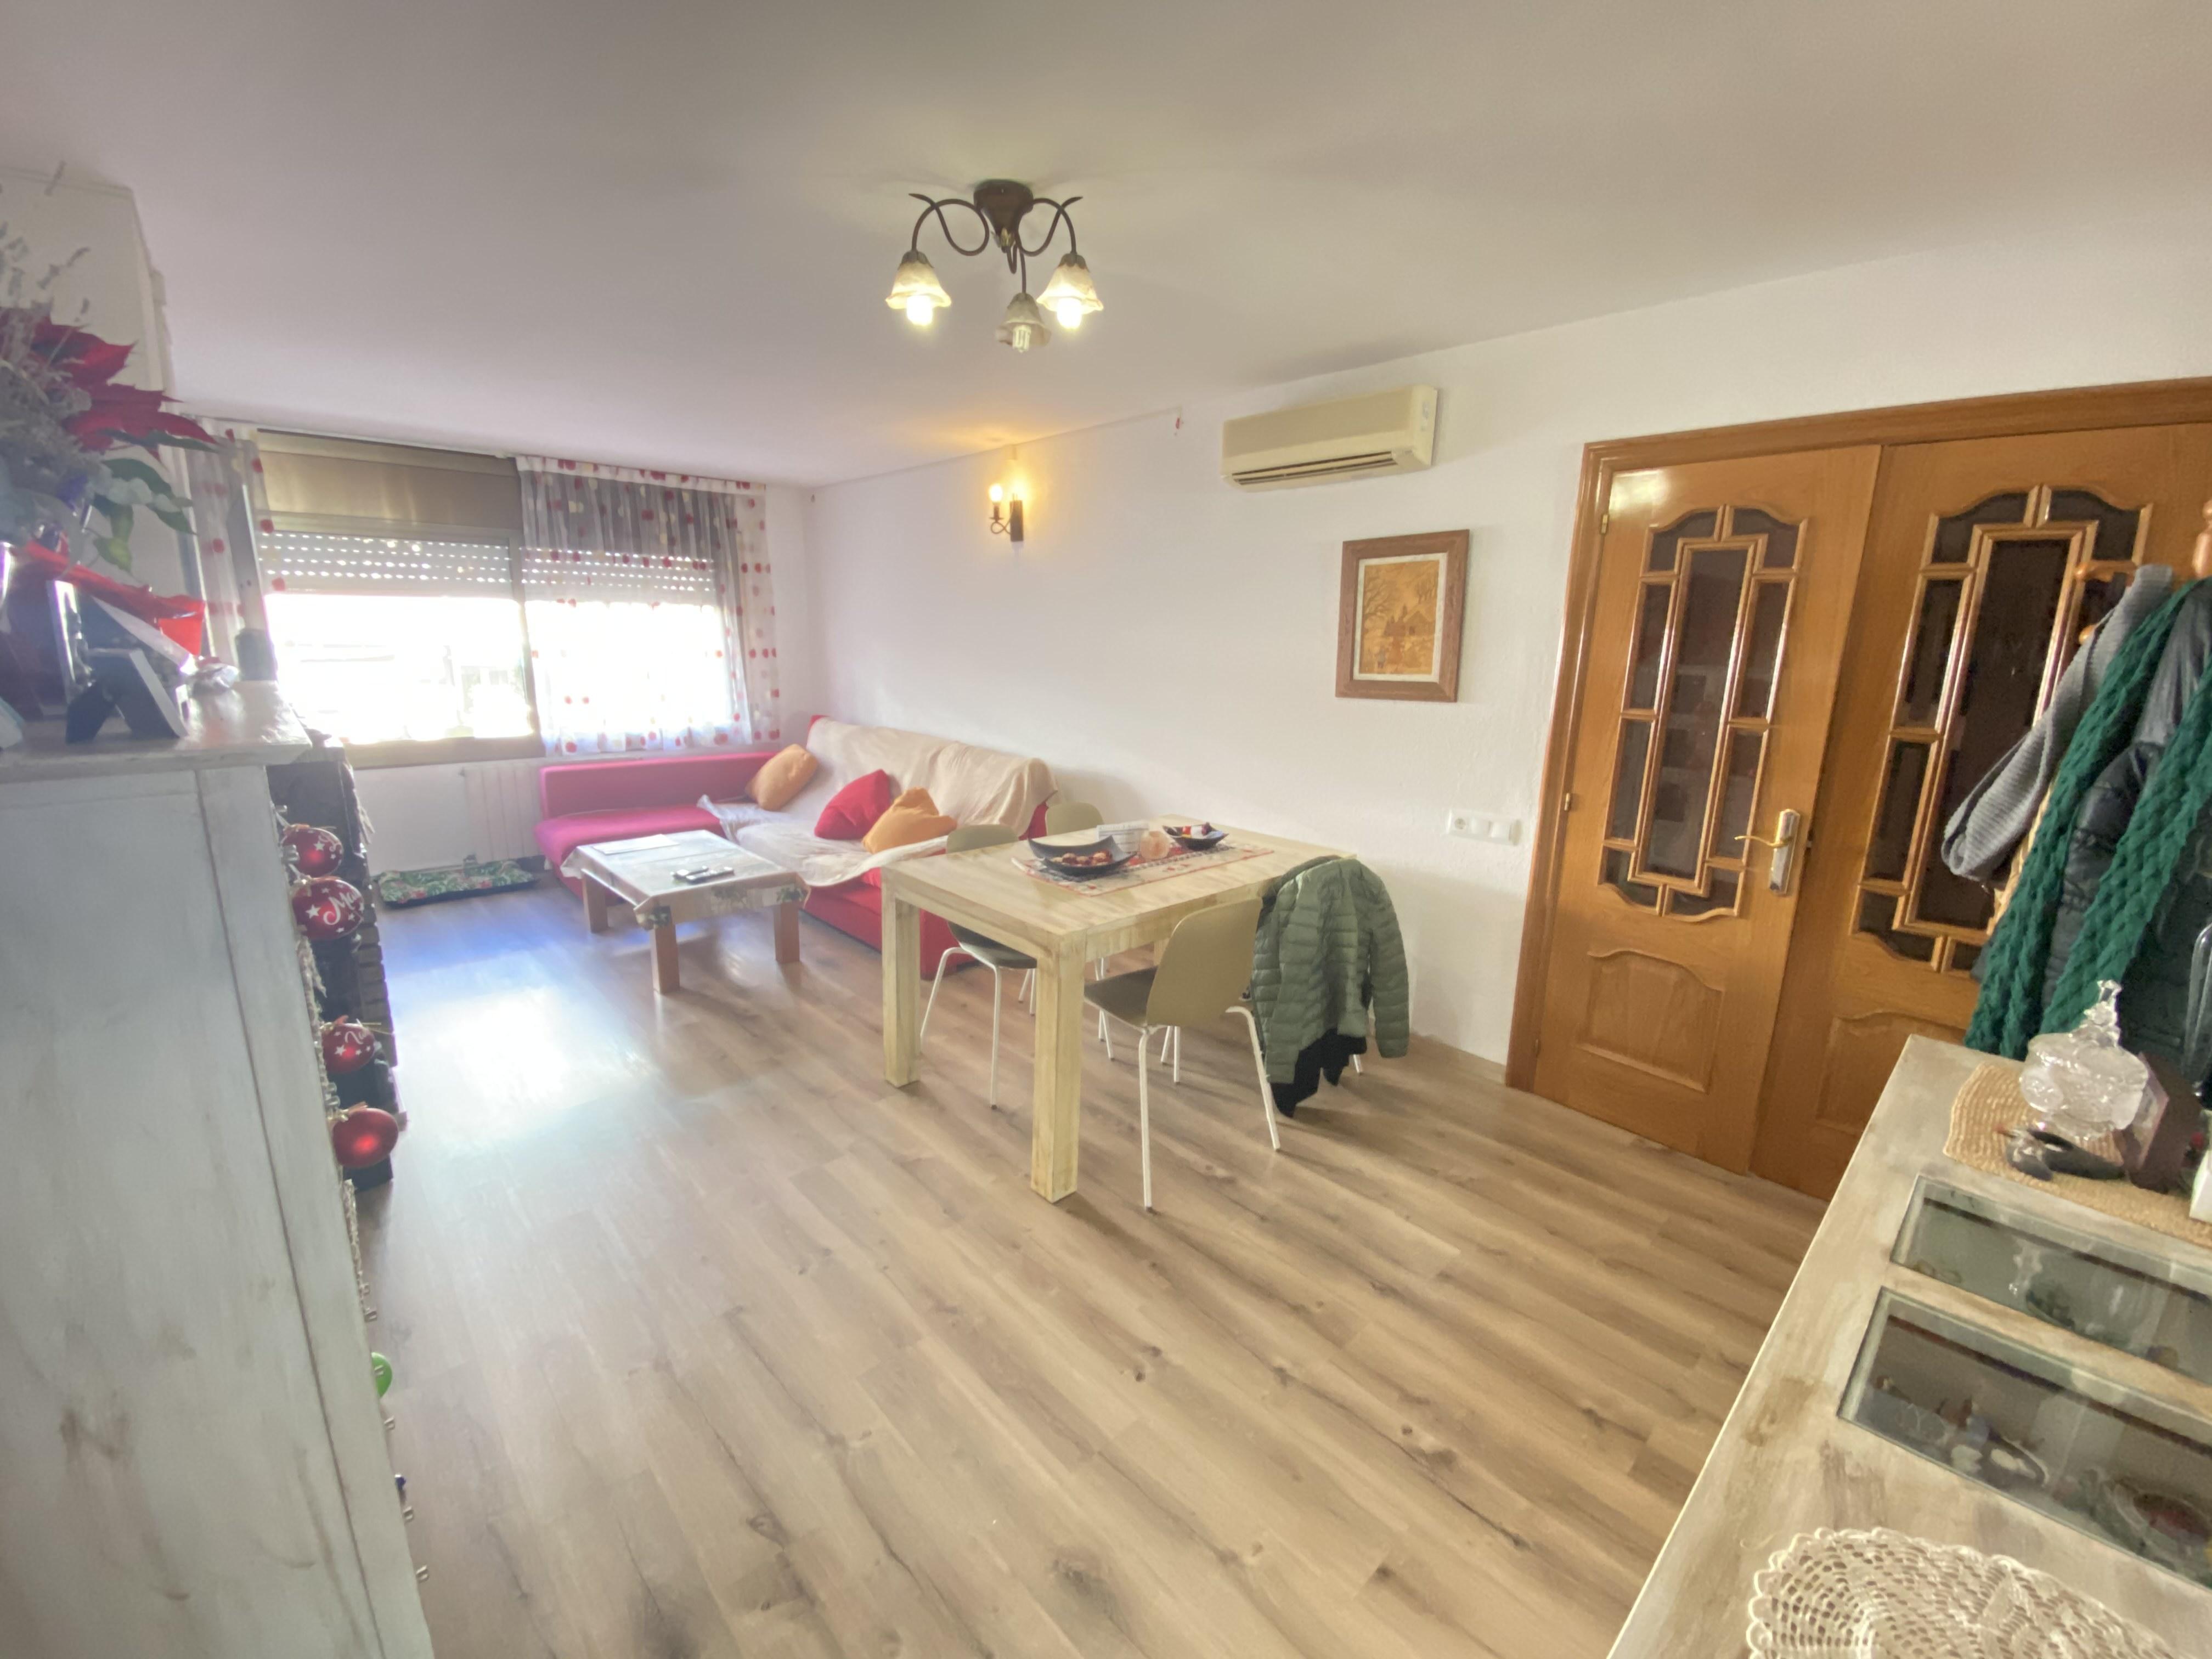 Piso en Can vidalet en Esplugues de Llobregat en Venta por 249.000€